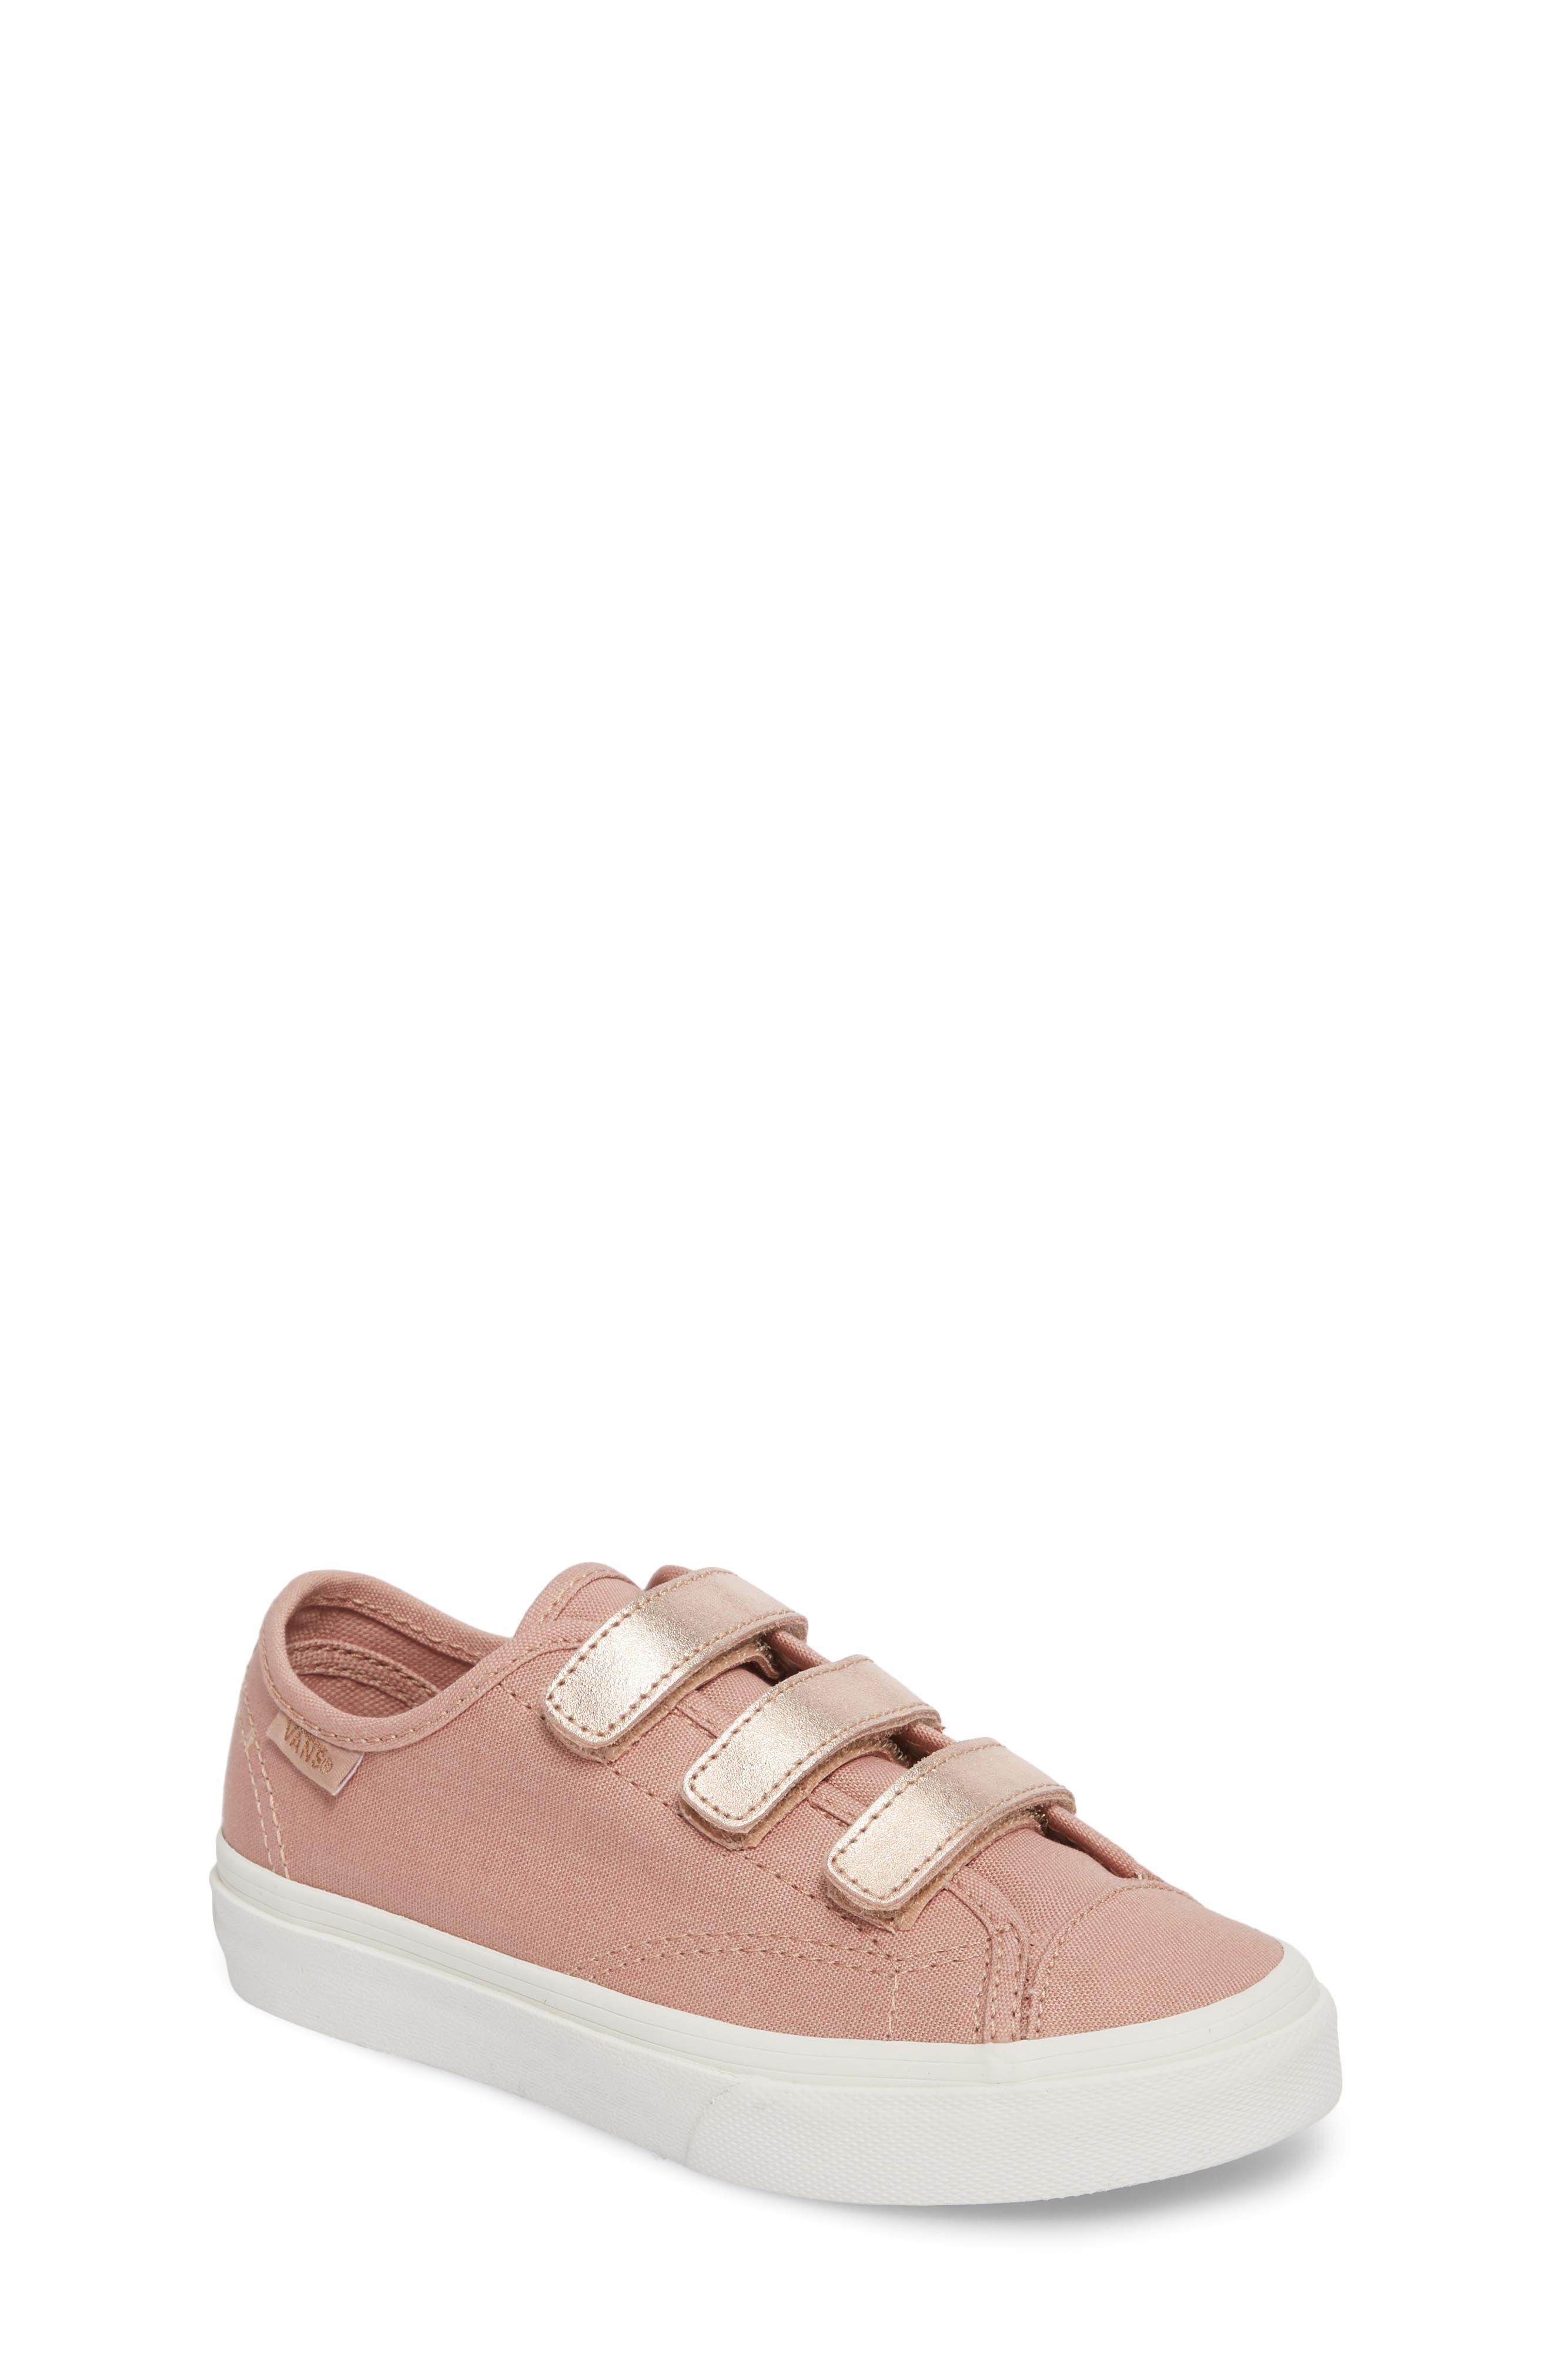 Style 23V Sneaker,                             Main thumbnail 1, color,                             220